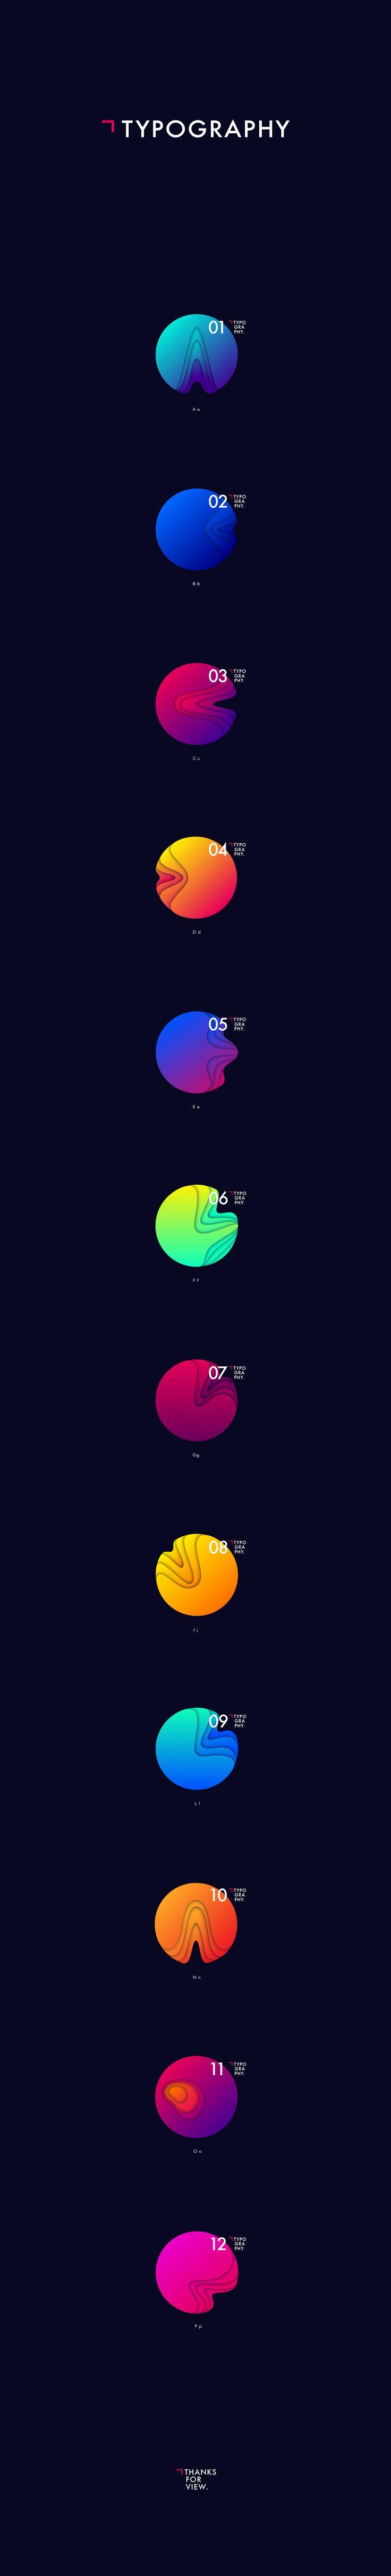 Planet typography on Behance